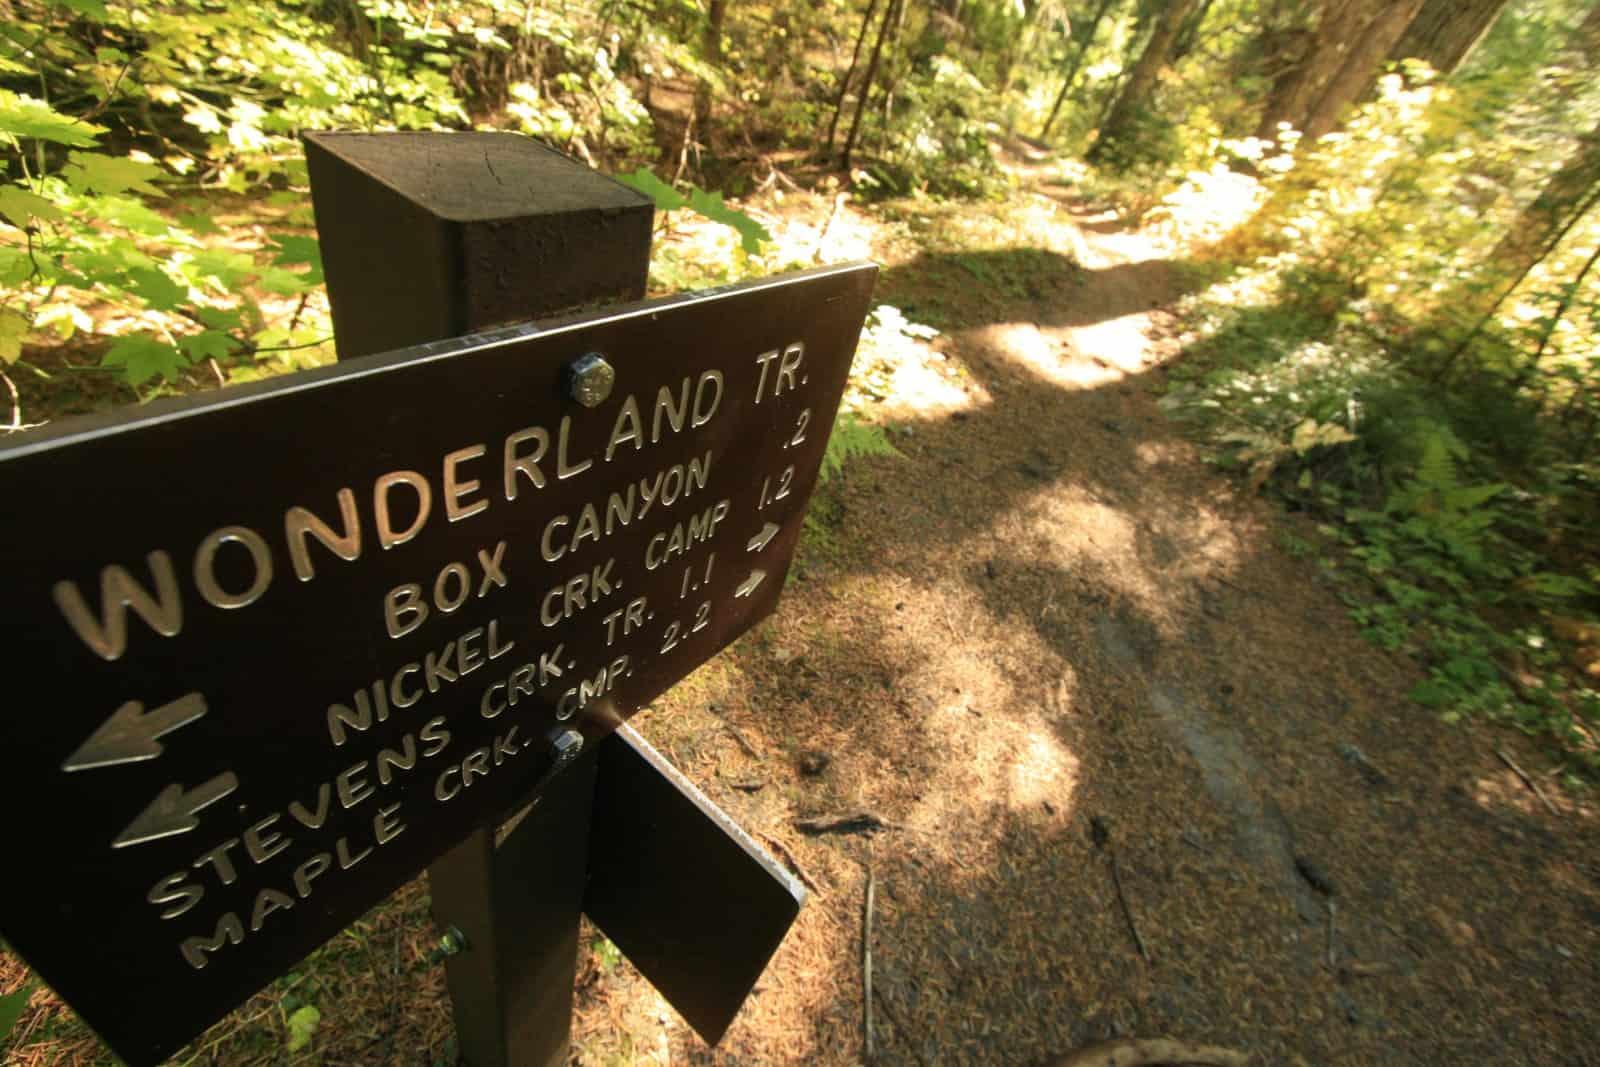 Wonderland Trail signage